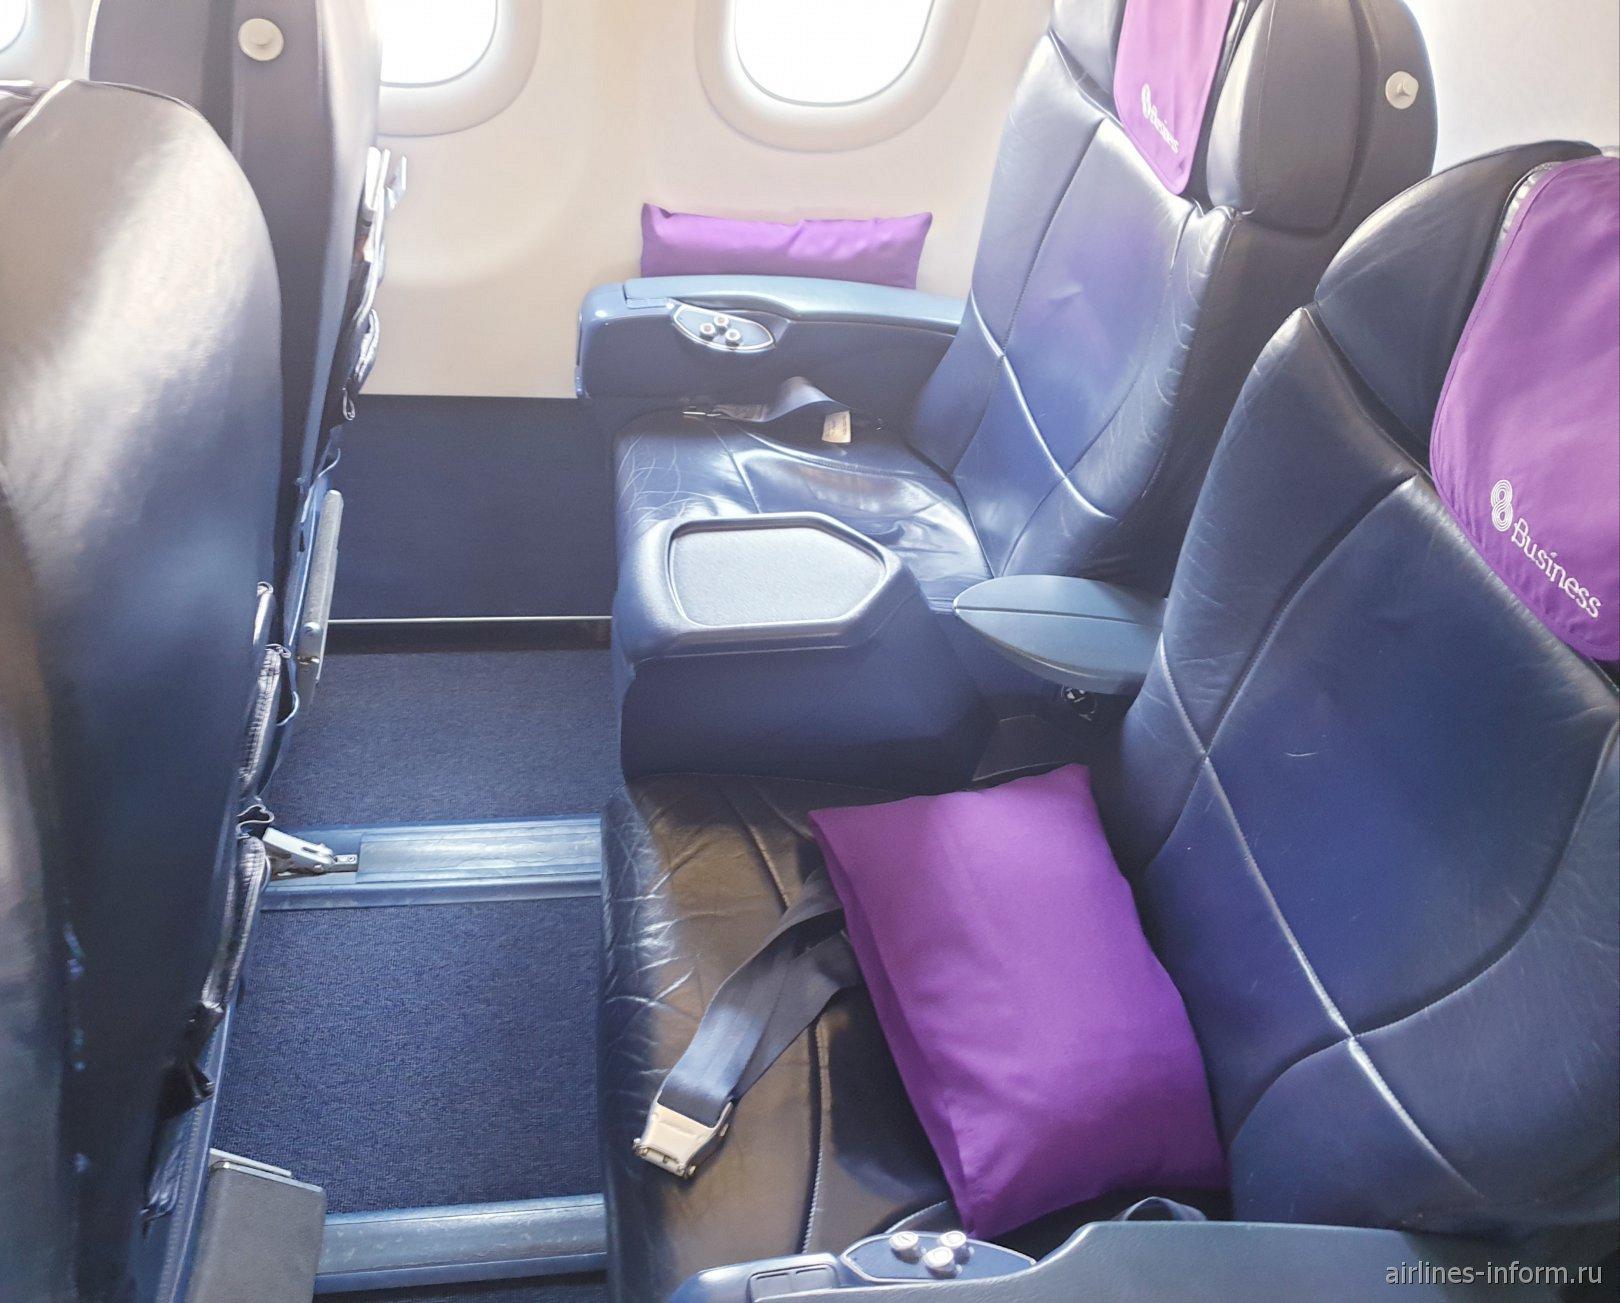 Кресла бизнес-класса в самолете Airbus A319 авиакомпании